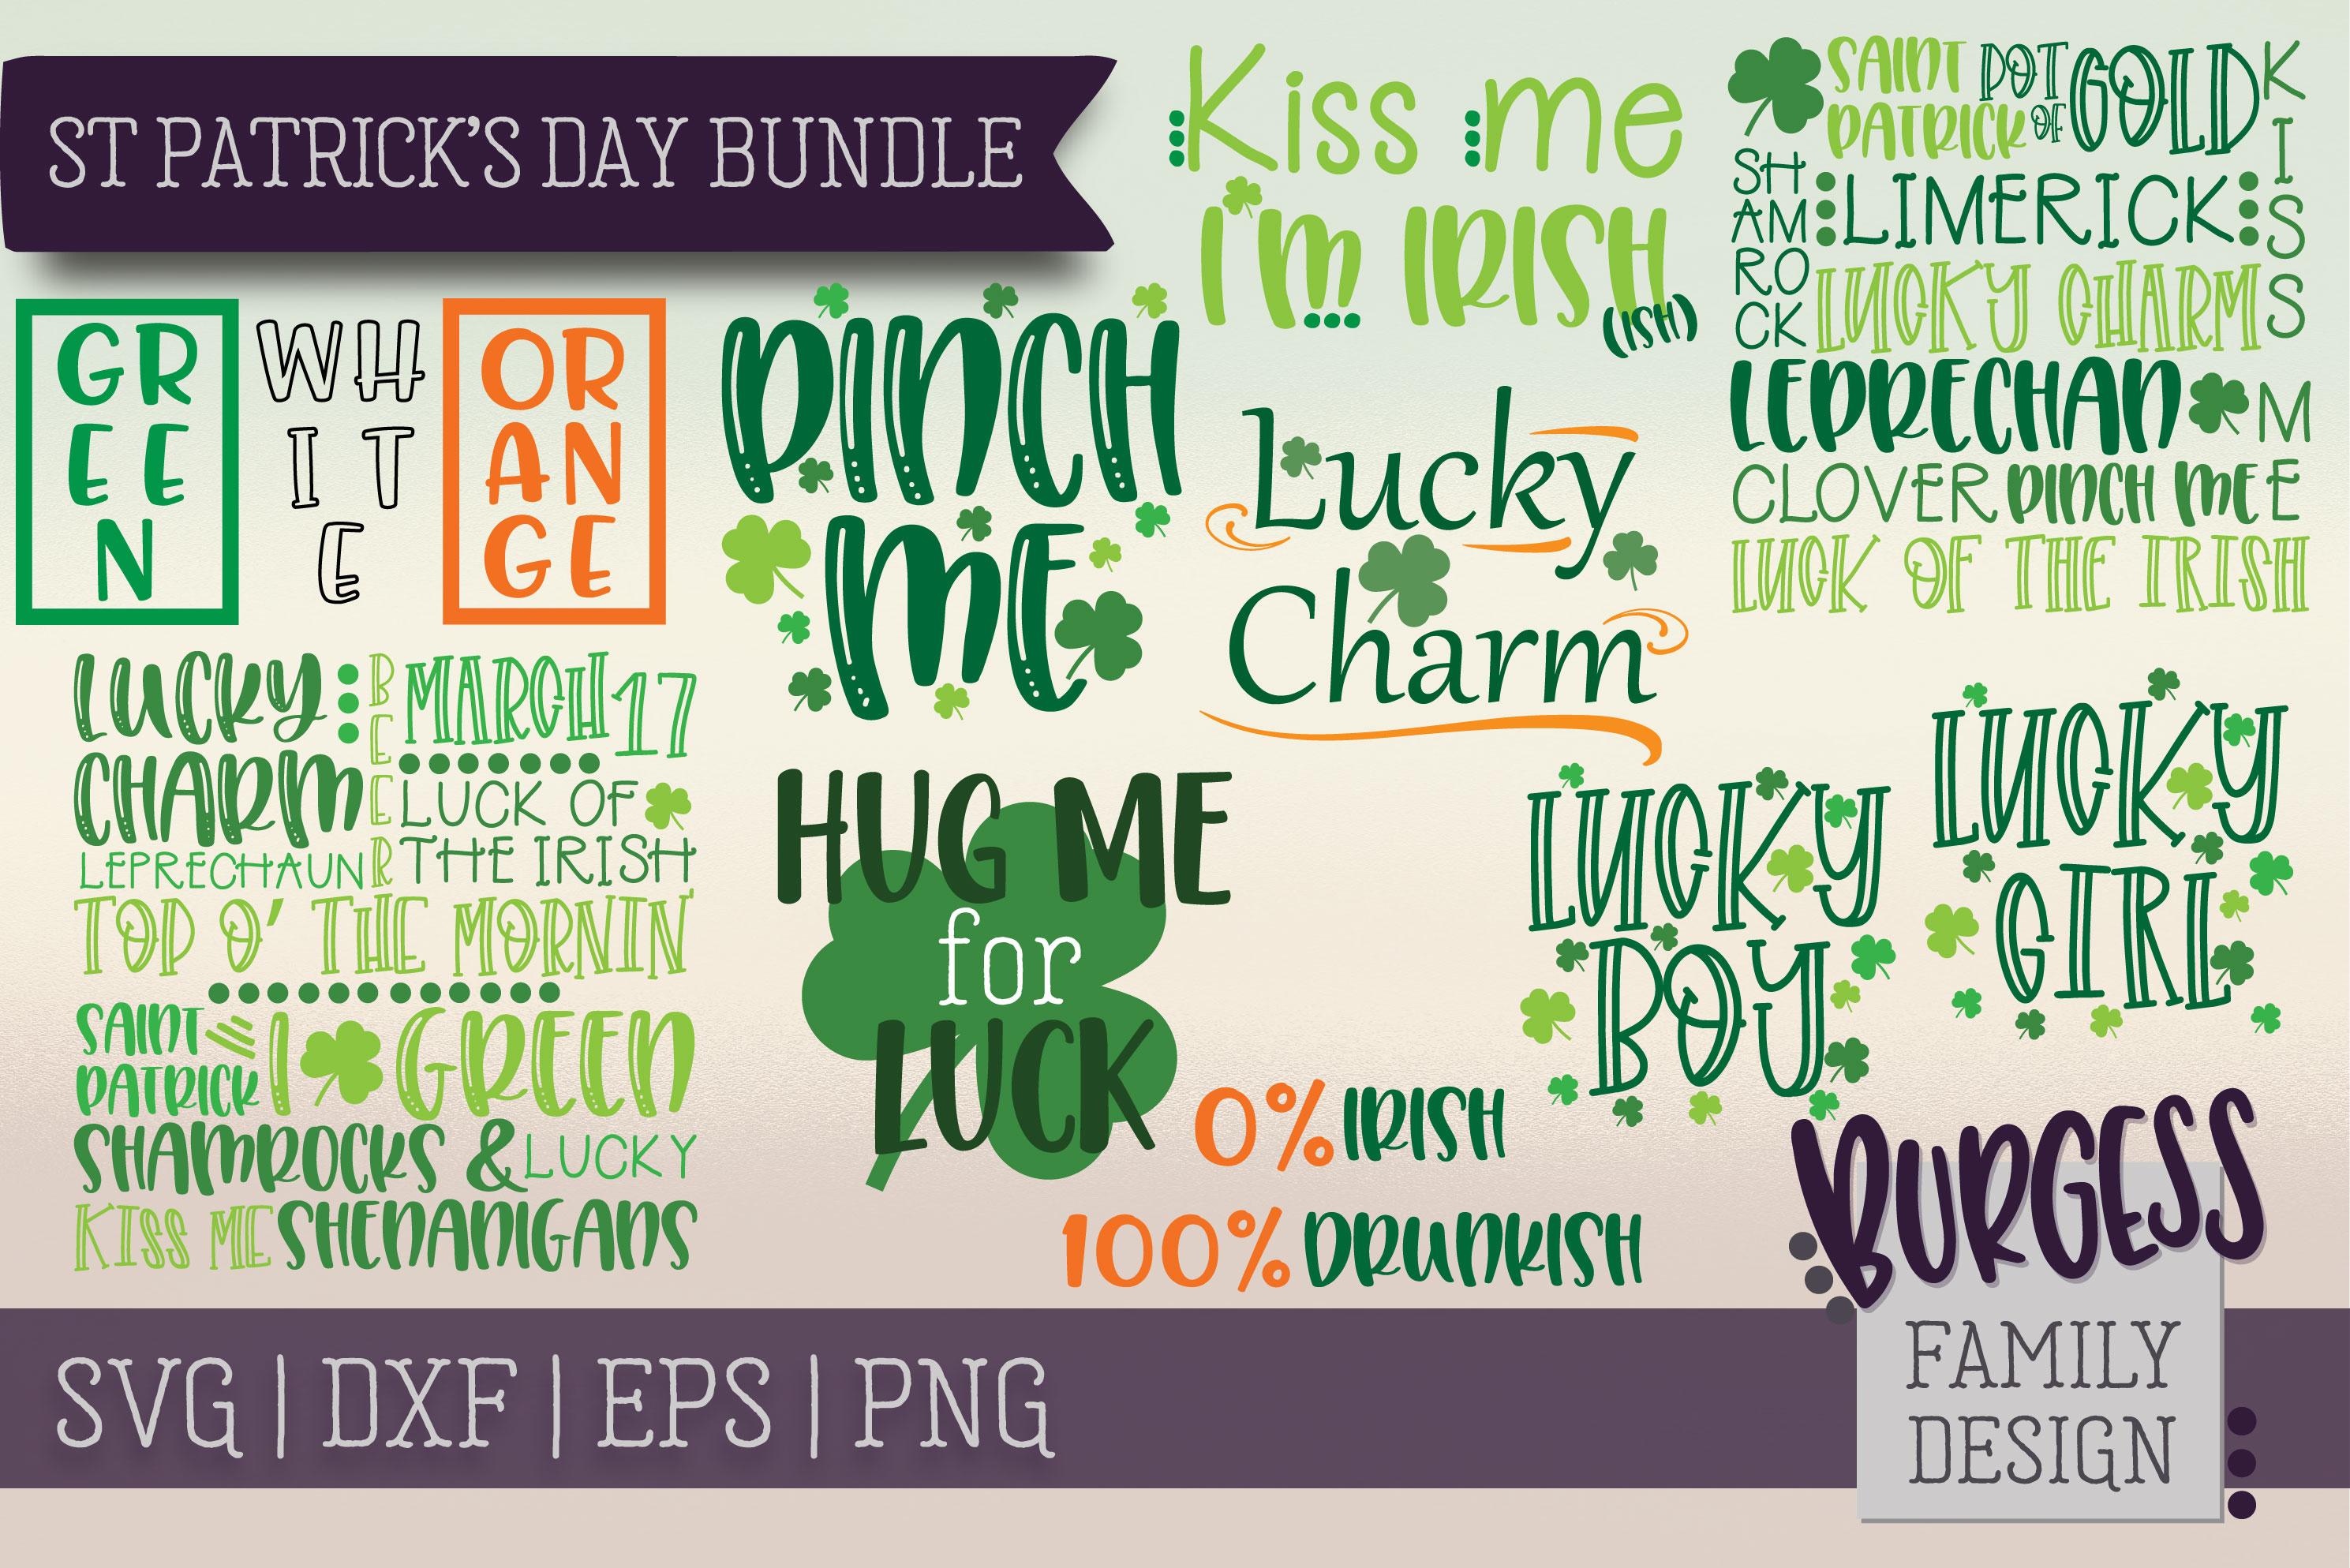 The starter bundle - Over 200 Designs | SVG DXF EPS PNG example image 9